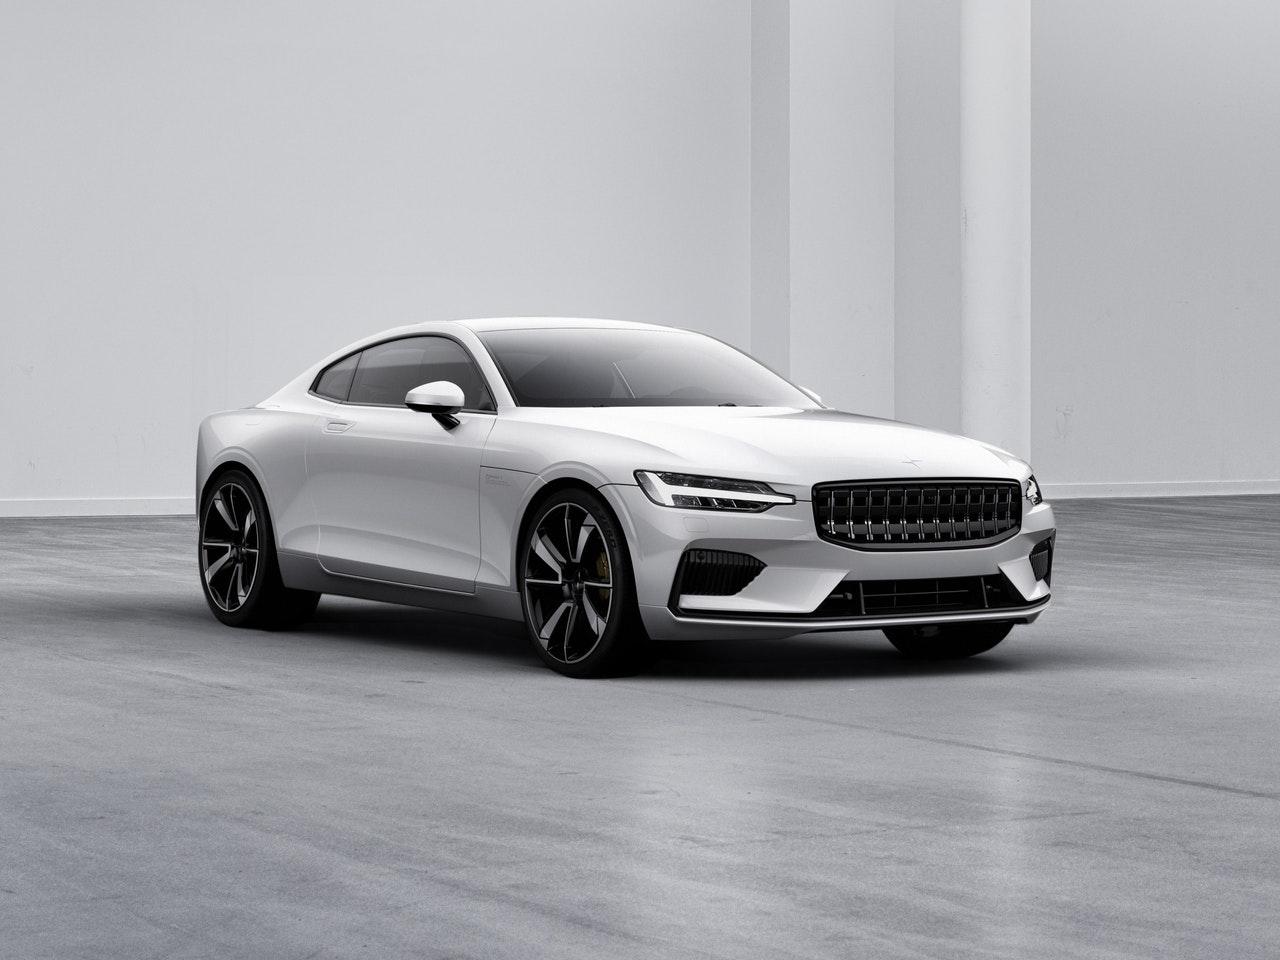 Polestar unveils its first car